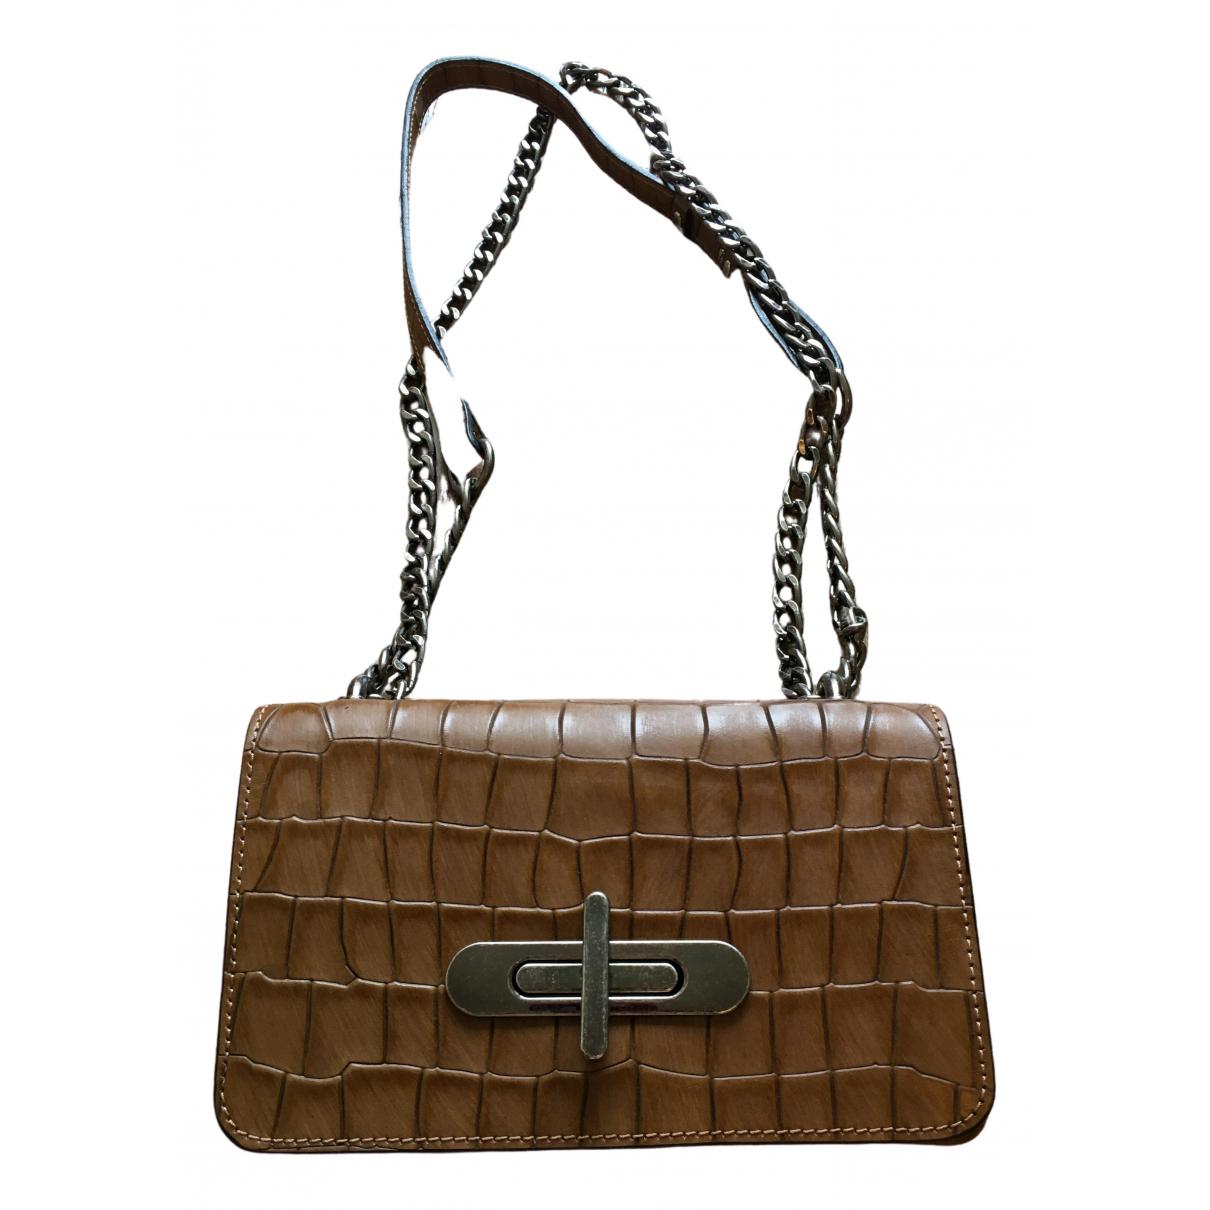 Baldinini N Brown Suede handbag for Women N